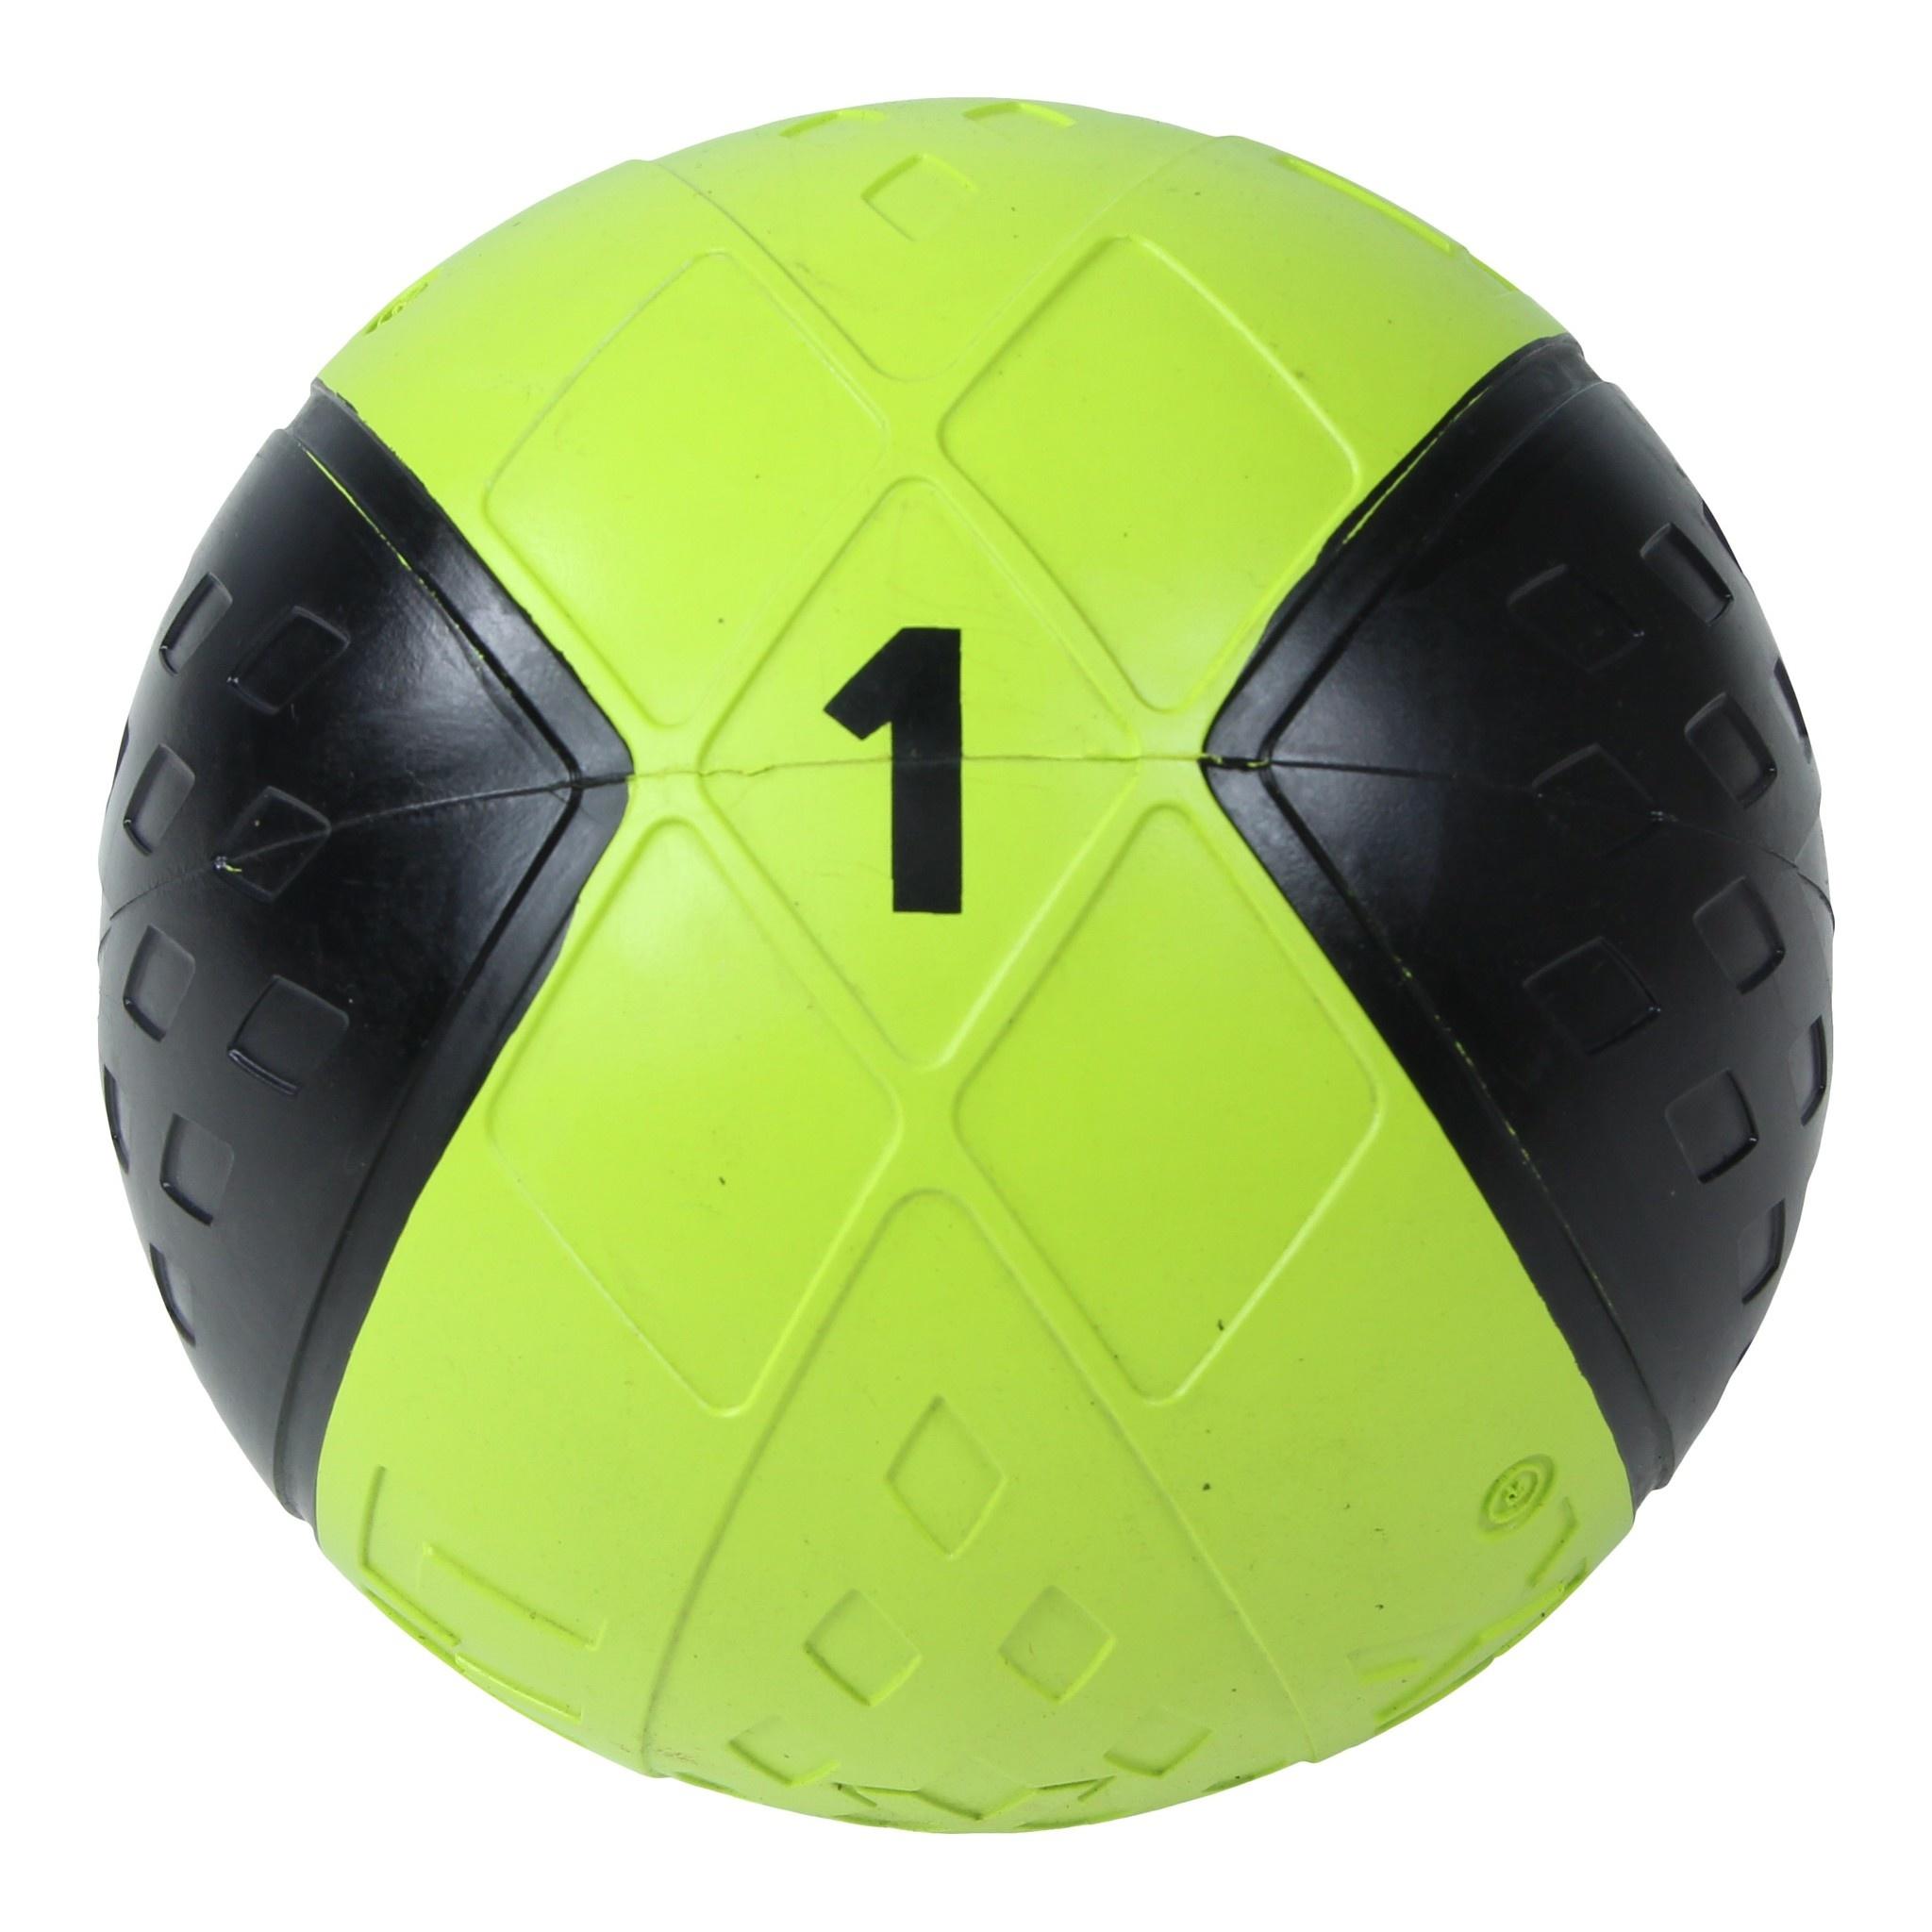 Lifemaxx Medicine Ball 1 kg